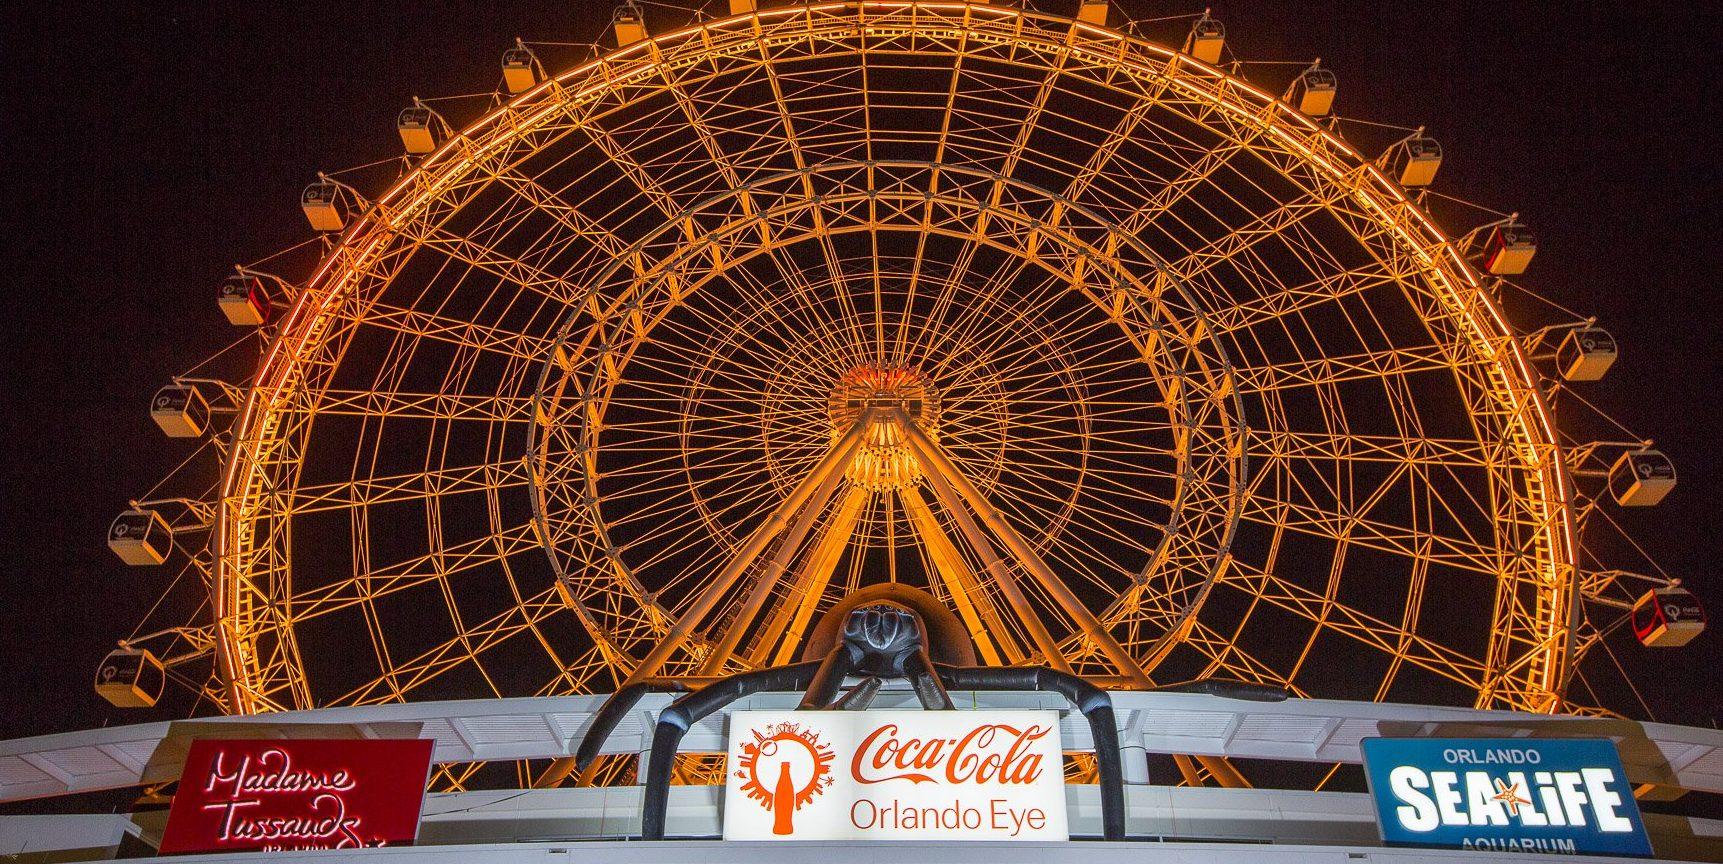 Geek in Orlando: Top 5 Reasons to Visit the Orlando Eye Attraction